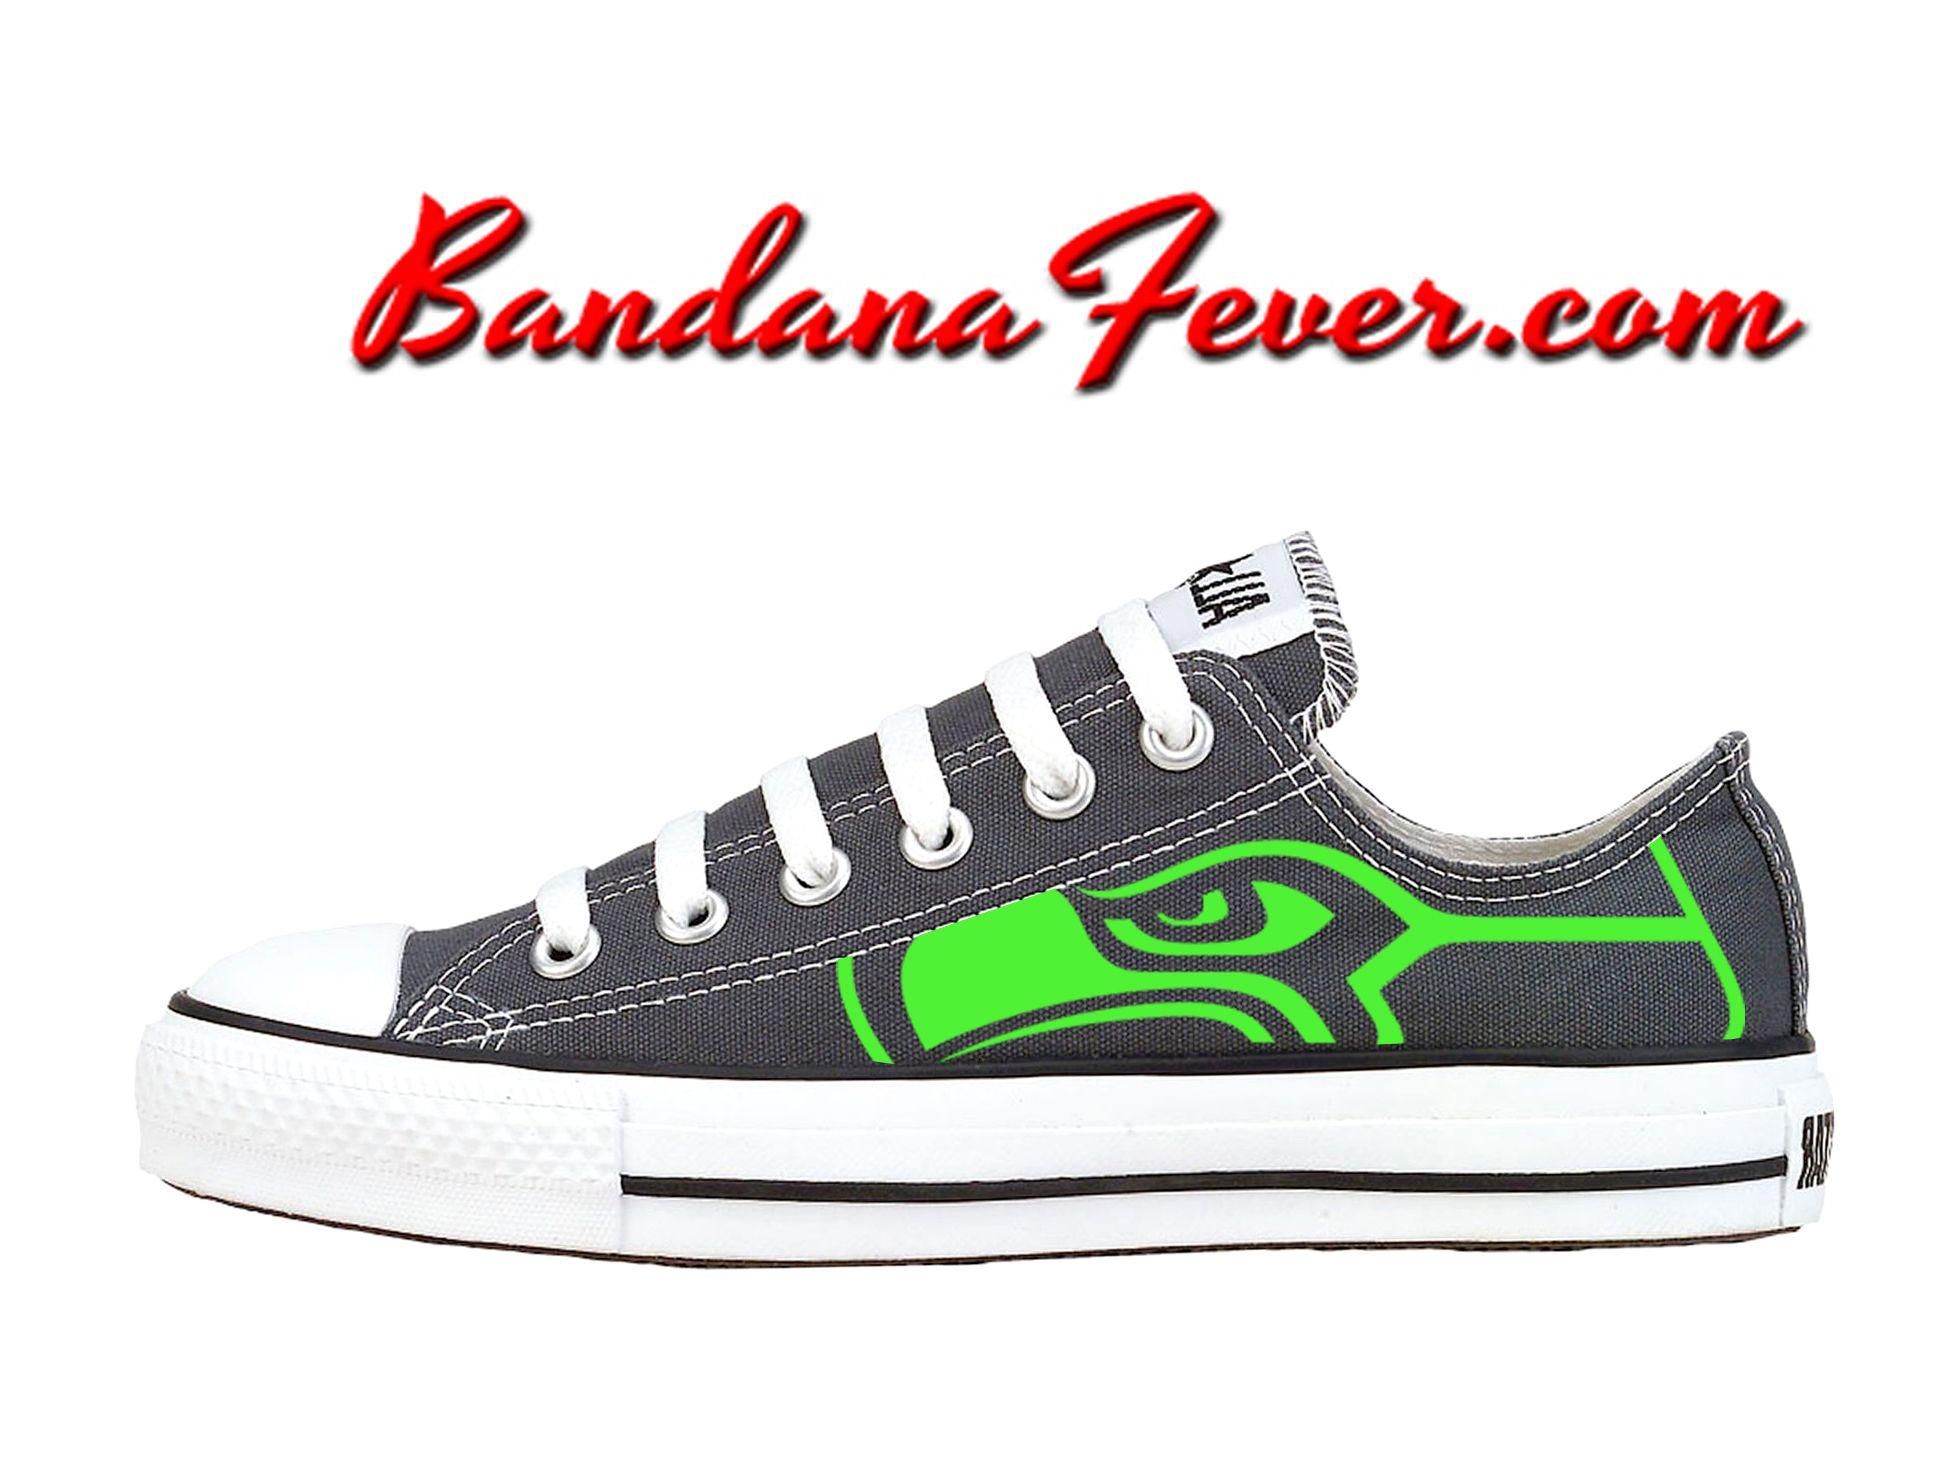 c940809ecd0d Custom Seahawks Lime Converse Shoes Low Charcoal